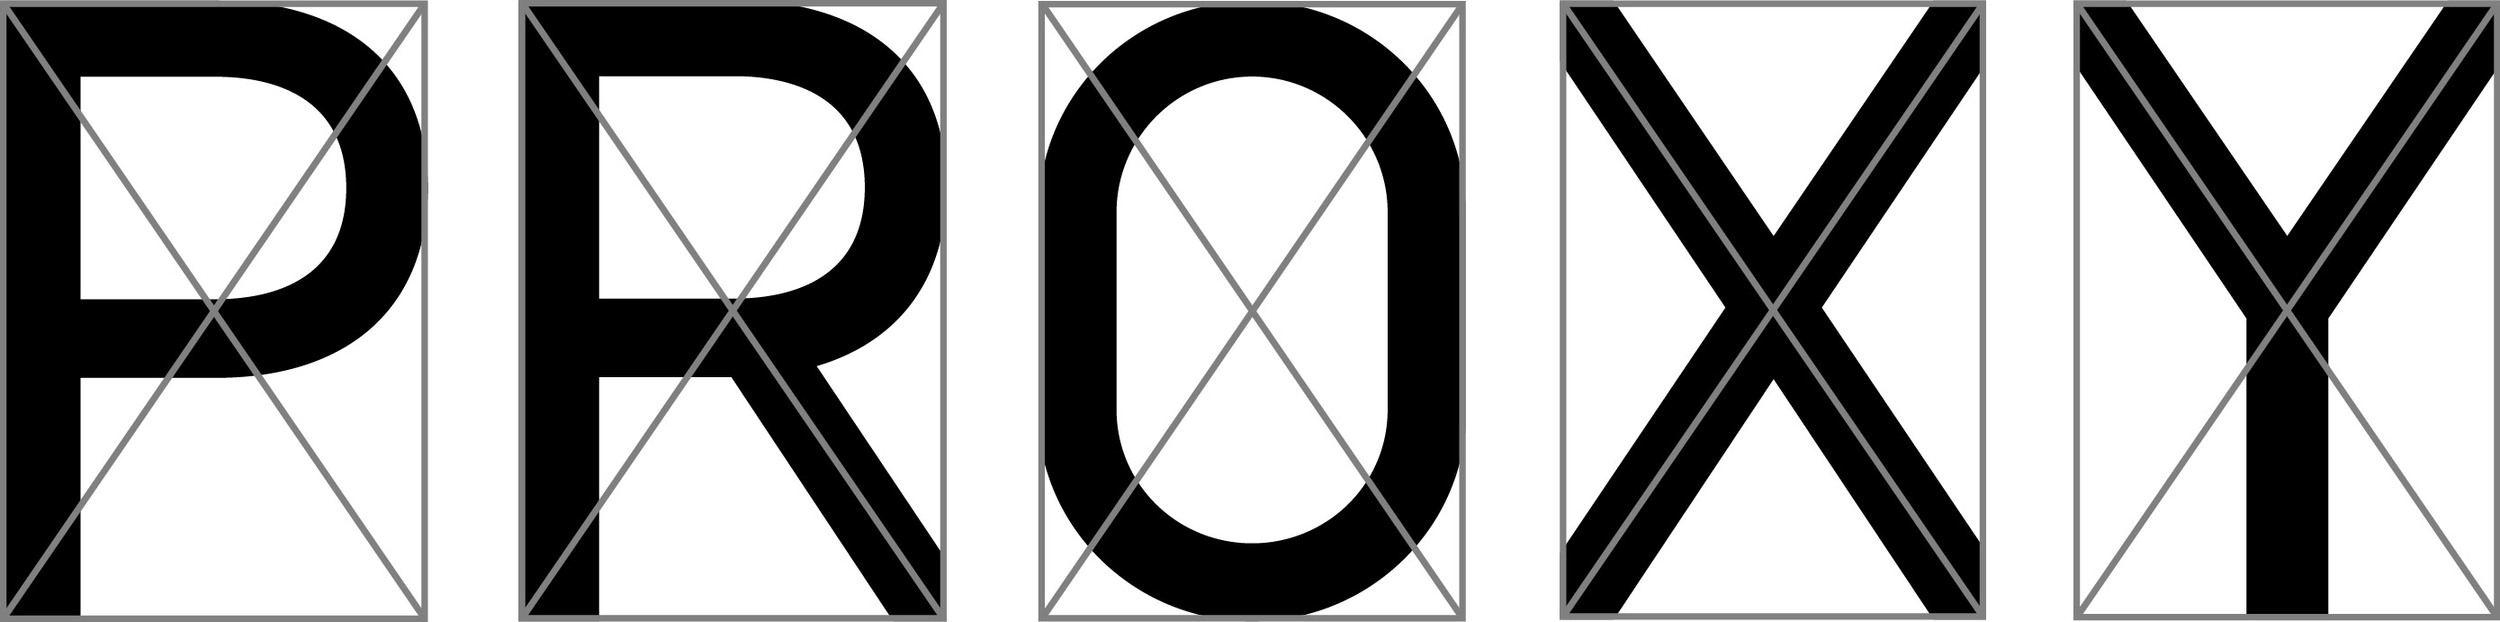 proxy logo_vector_bw_grey.jpg